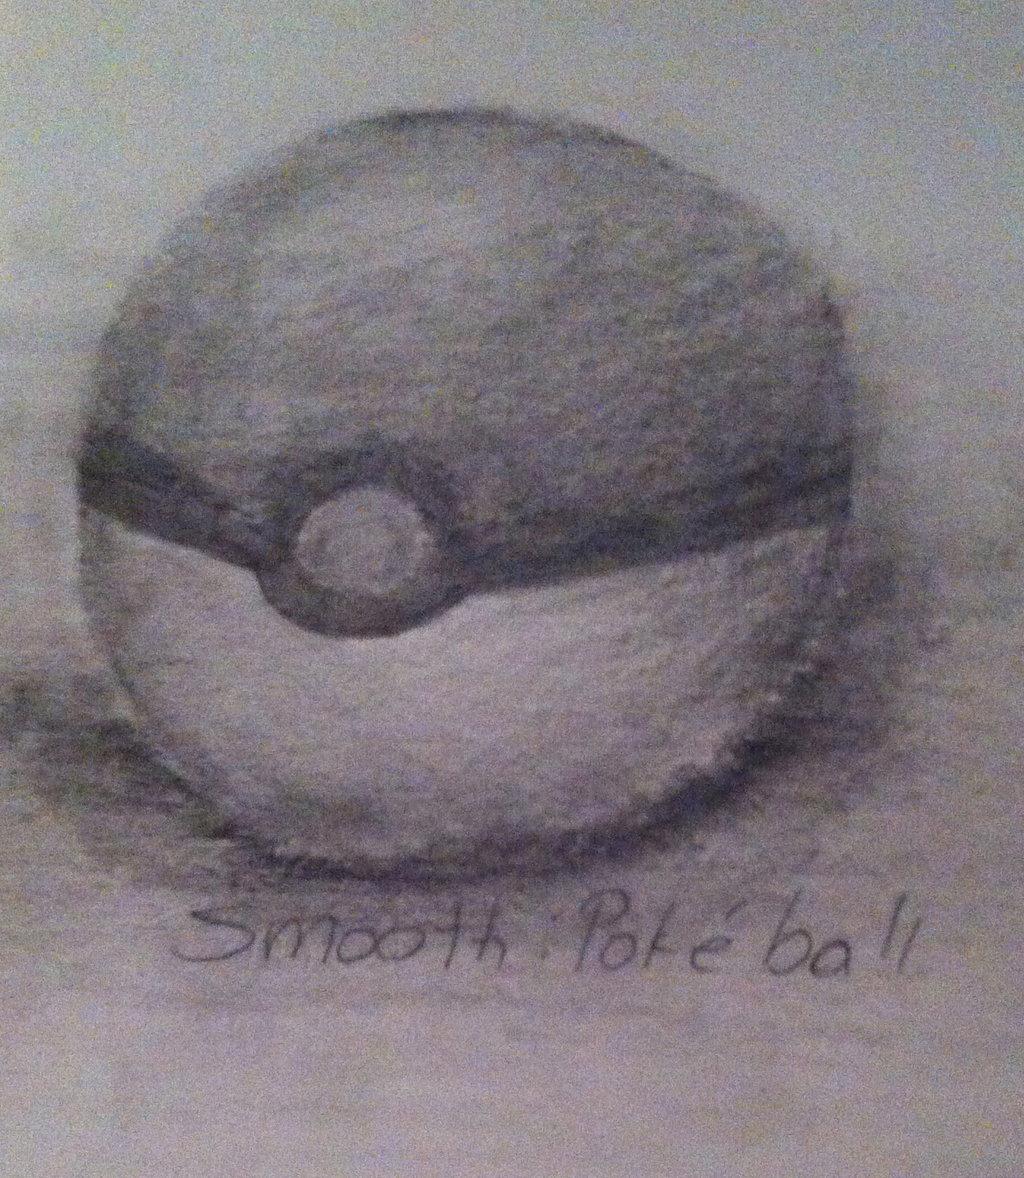 Drawn pokeball shaded Pokeball HalfafanD Smooth DeviantArt Pokeball